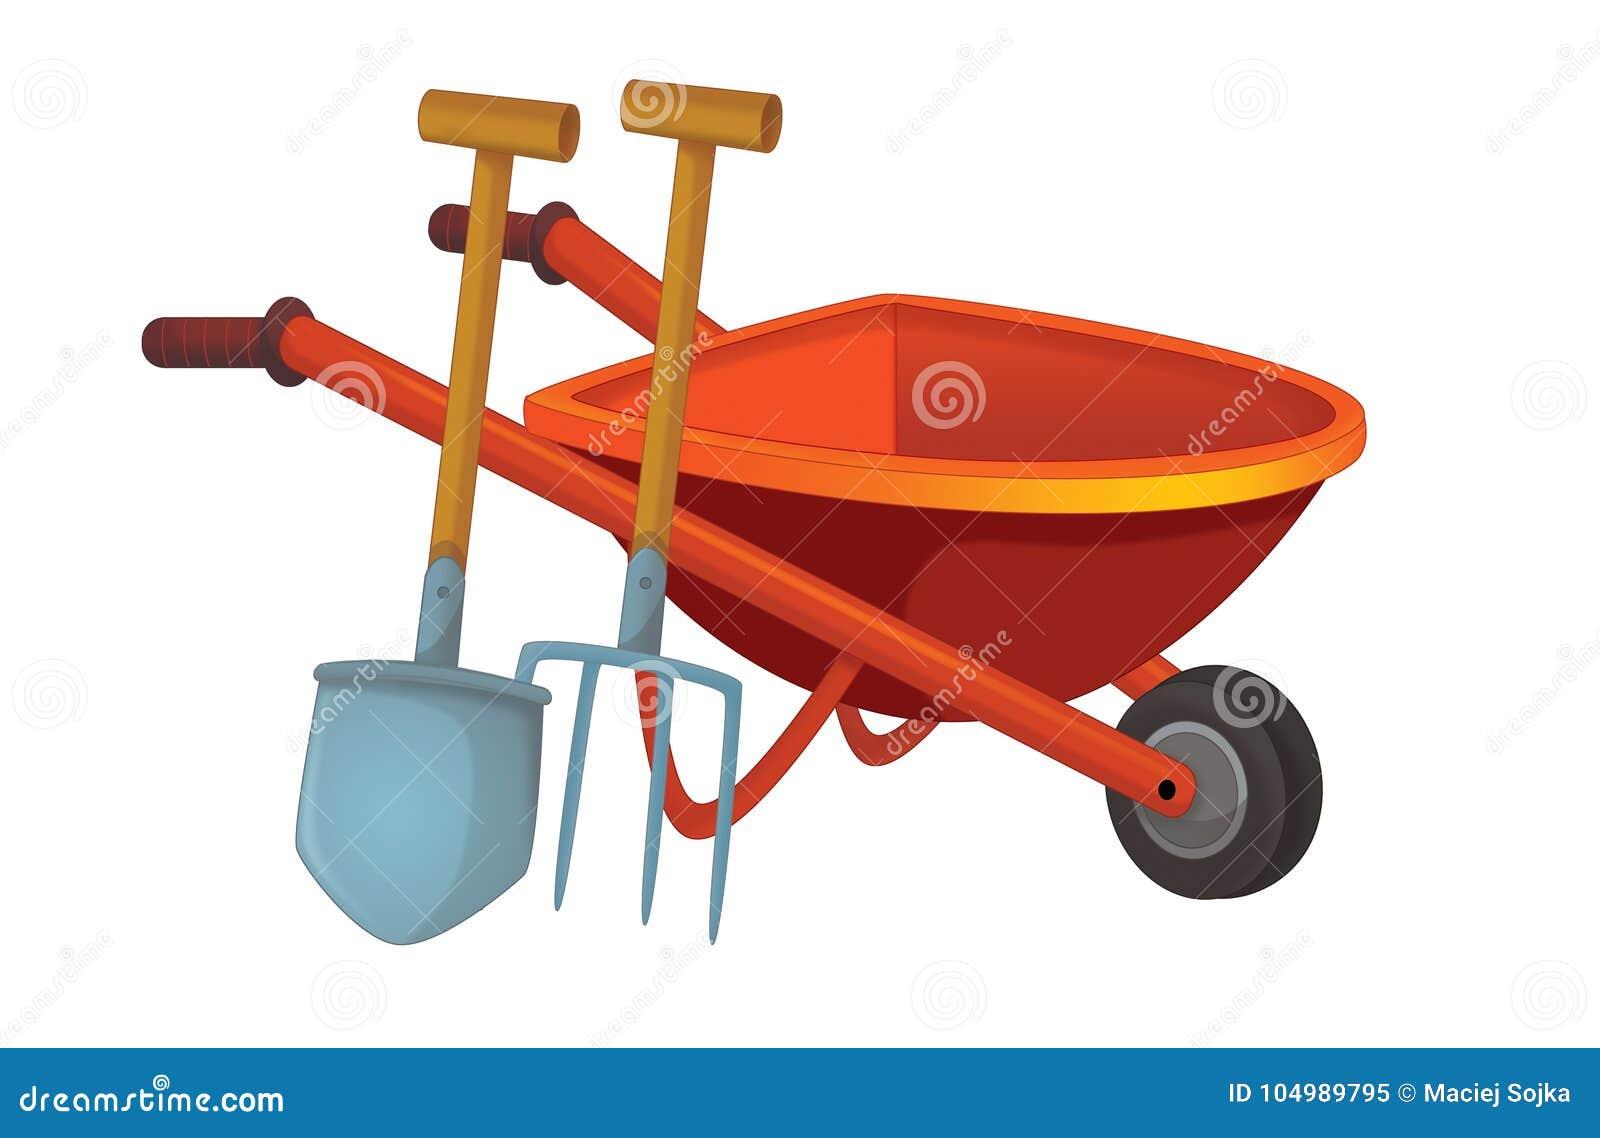 Cartoon scene with wheelbarrow with gardenin or farm tool